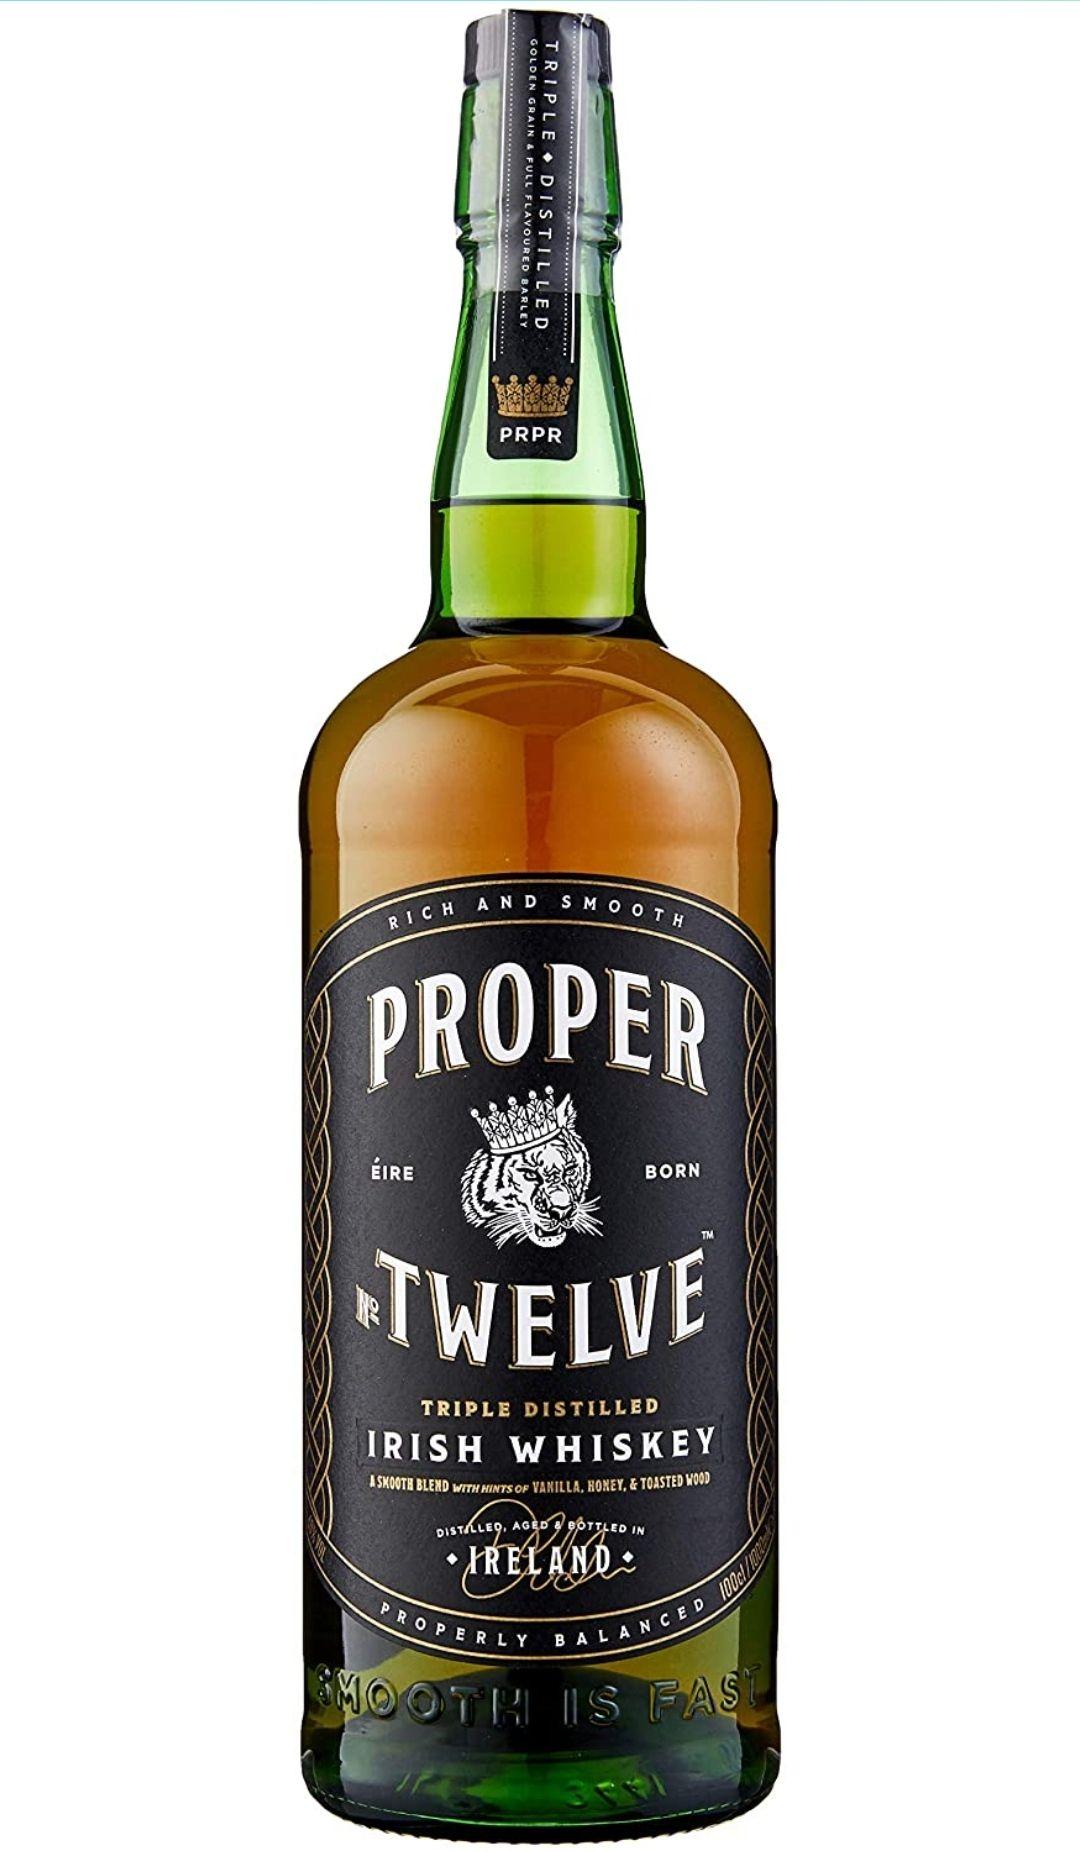 Proper No Twelve, 1 Litre - £25.50 @ Amazon Prime Exclusive